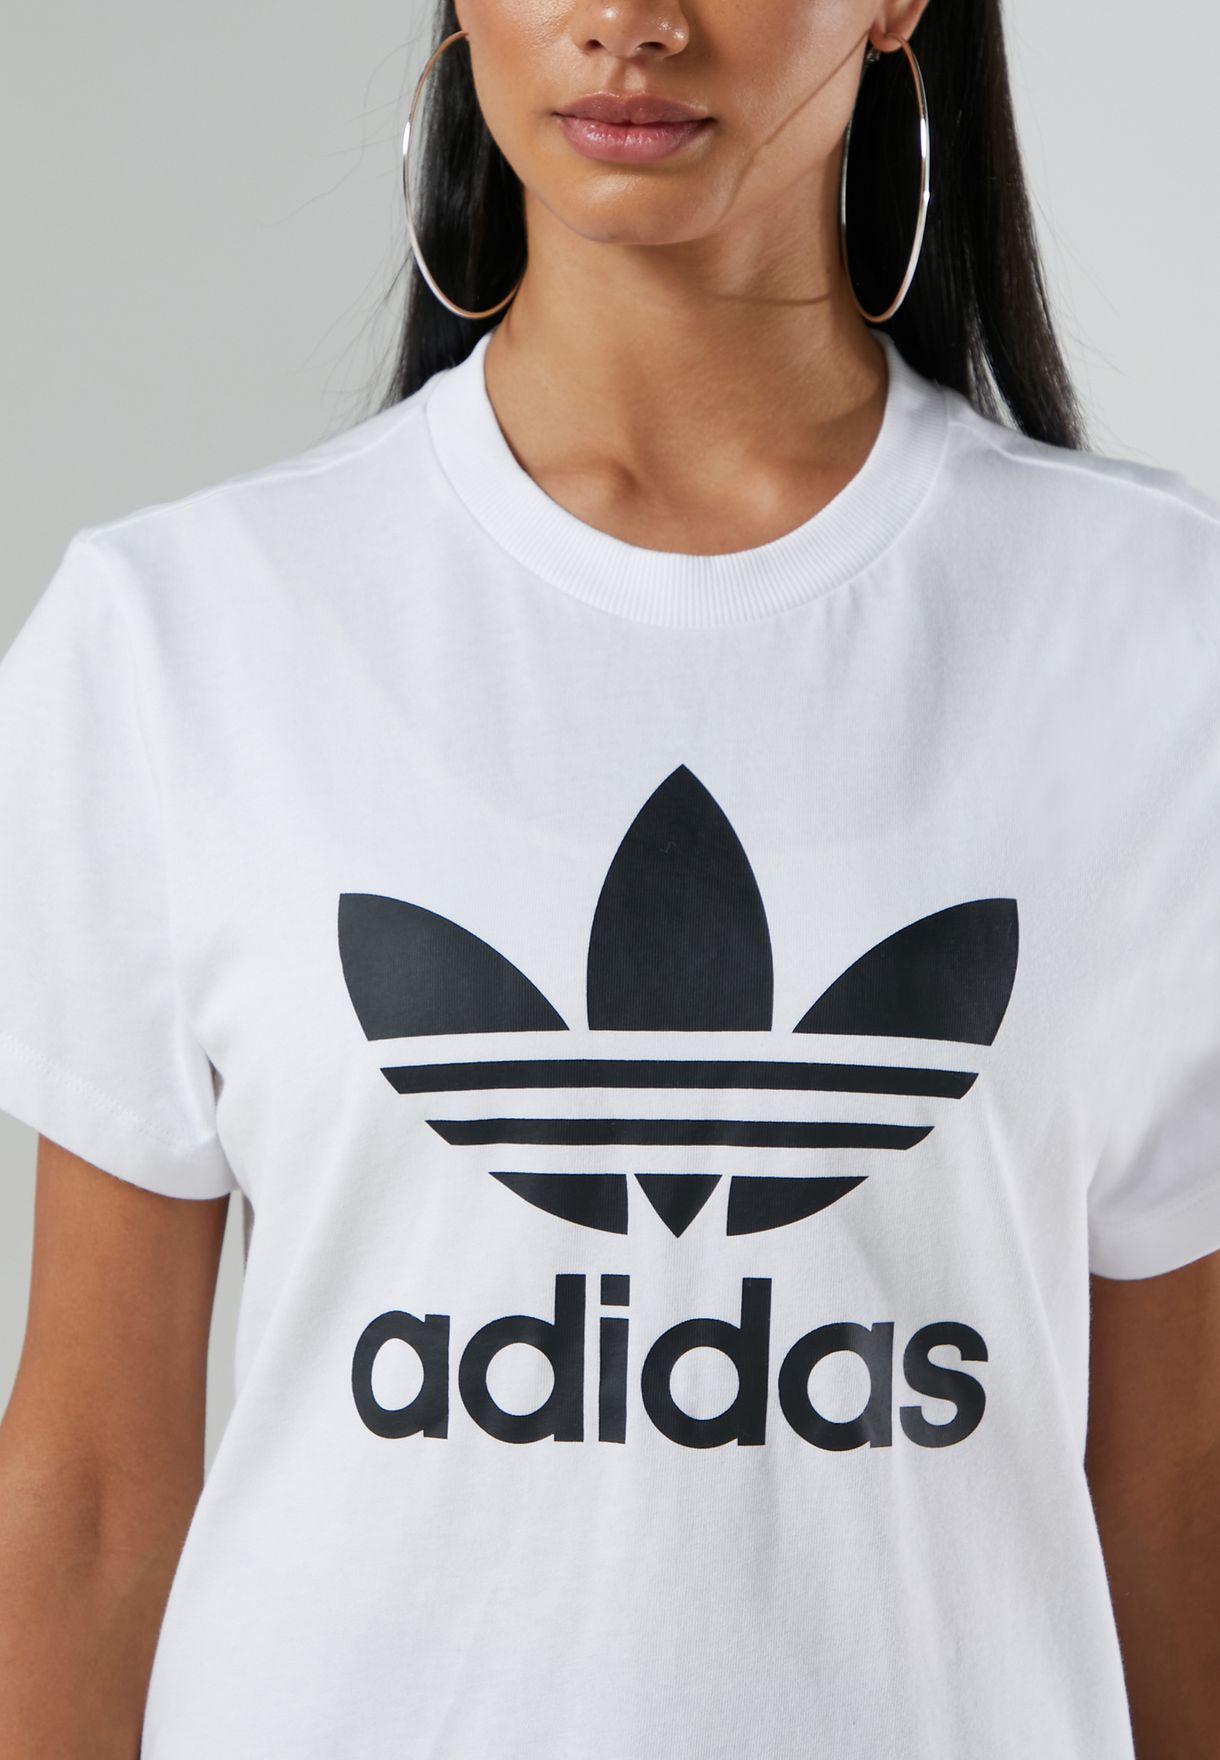 Adicolor Casual Women's T-Shirt